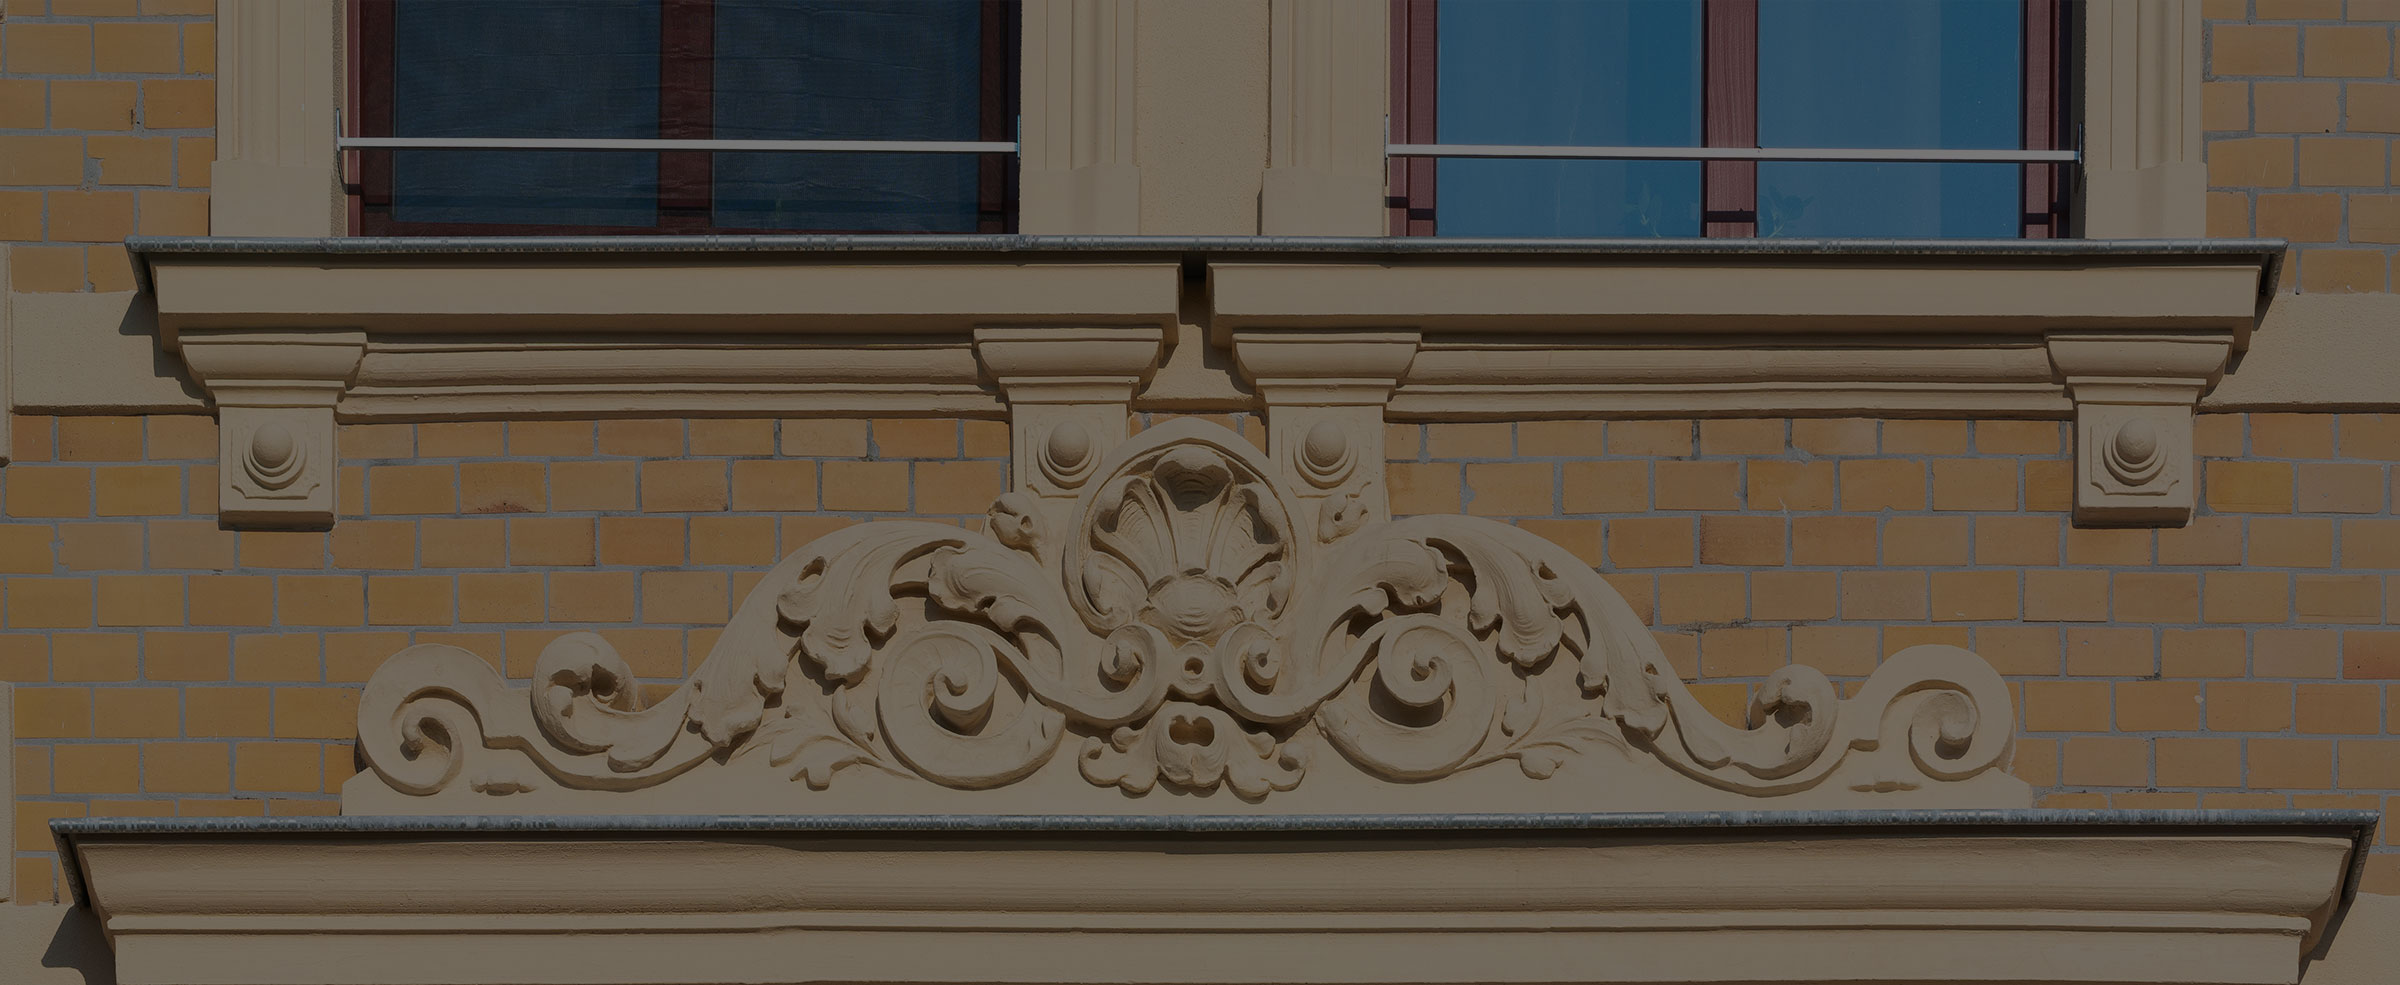 Denkmalgeschütztes Haus umbauen, Denkmalgeschütztes haus sanieren, Energieberatung Denkmalschutz